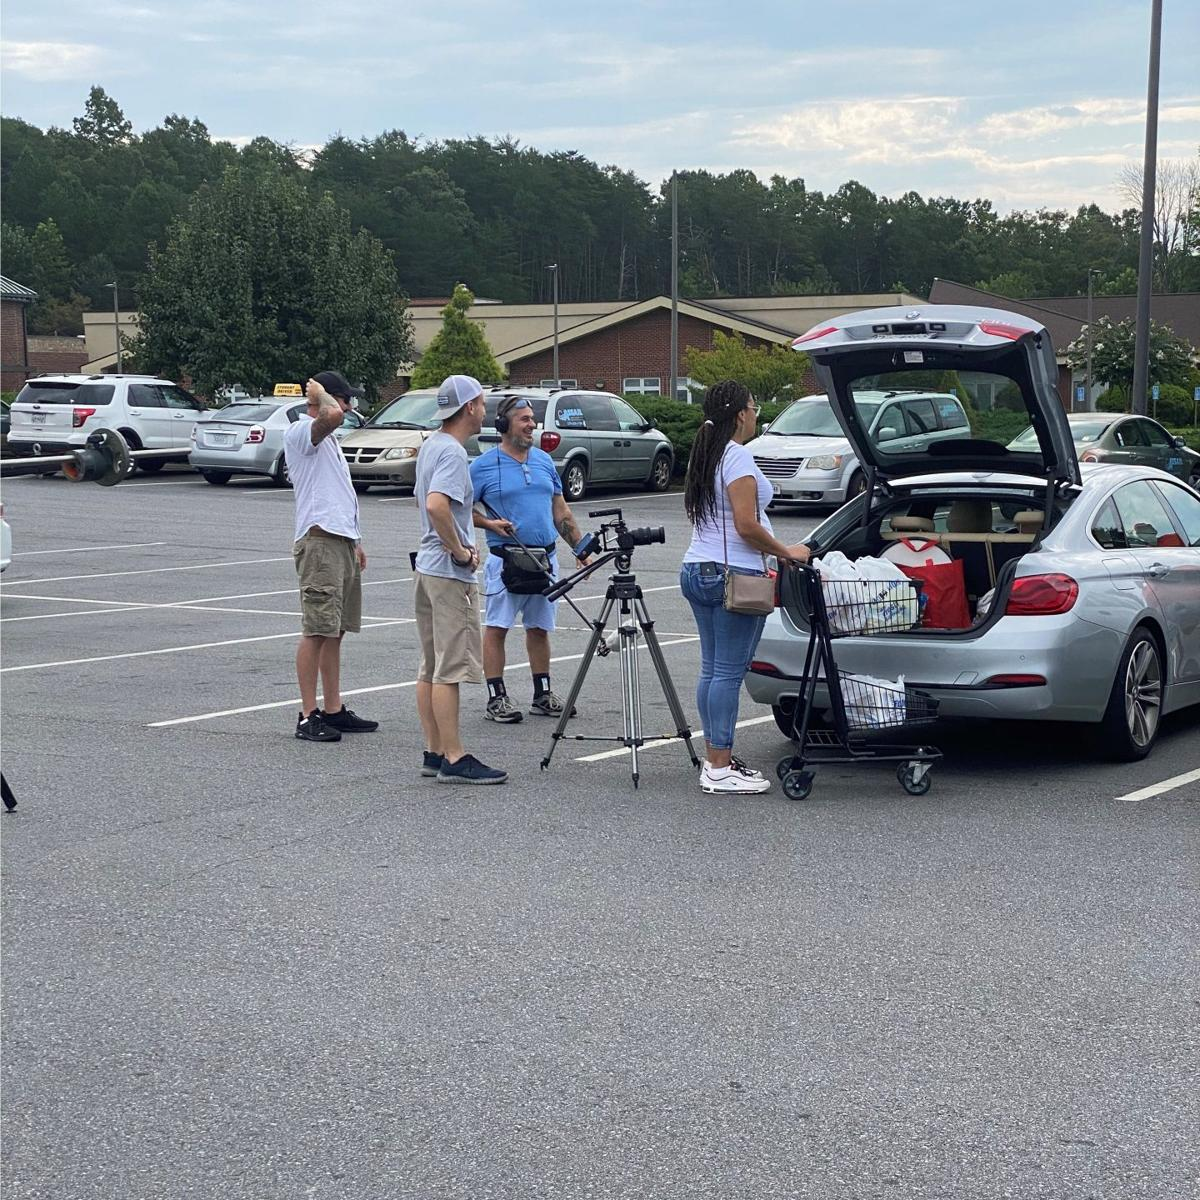 Sc parking lot filming